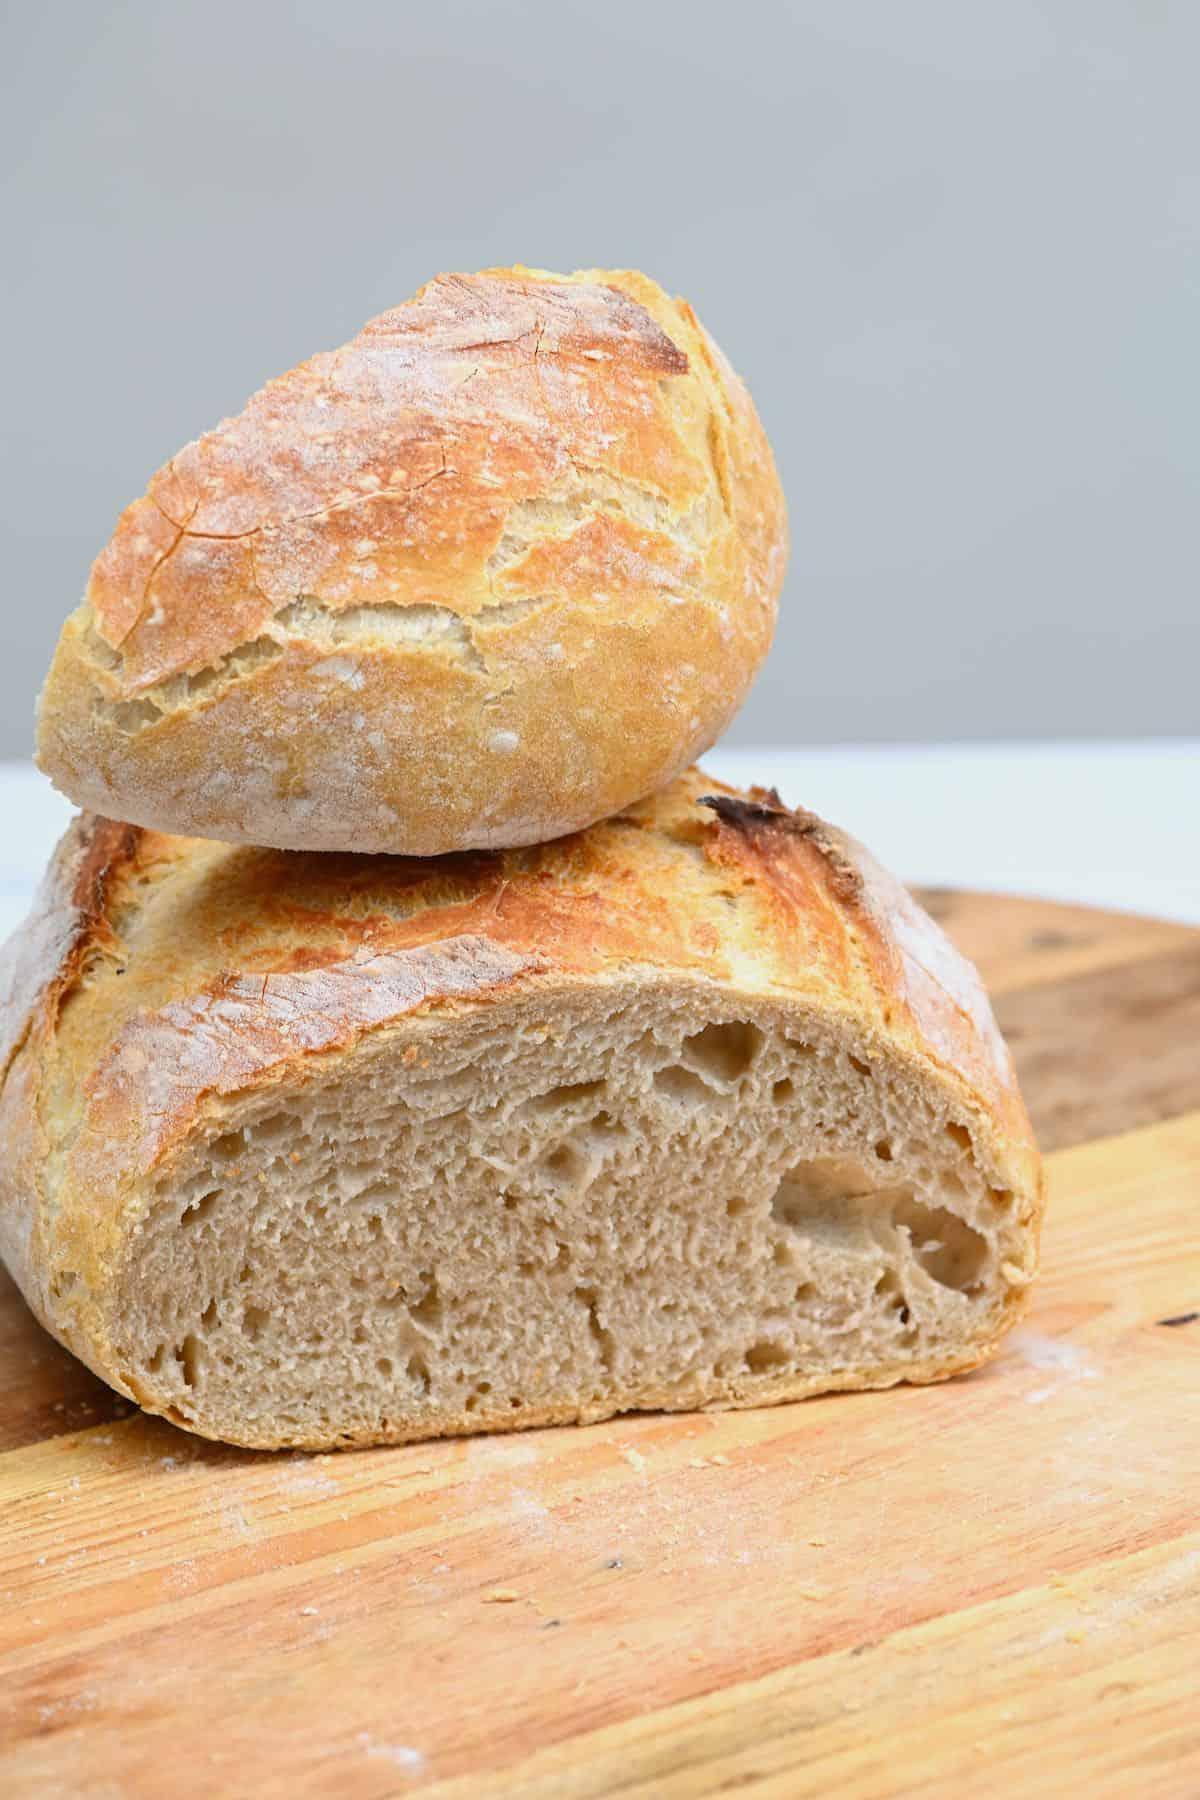 No-knead bread with the corner cut off